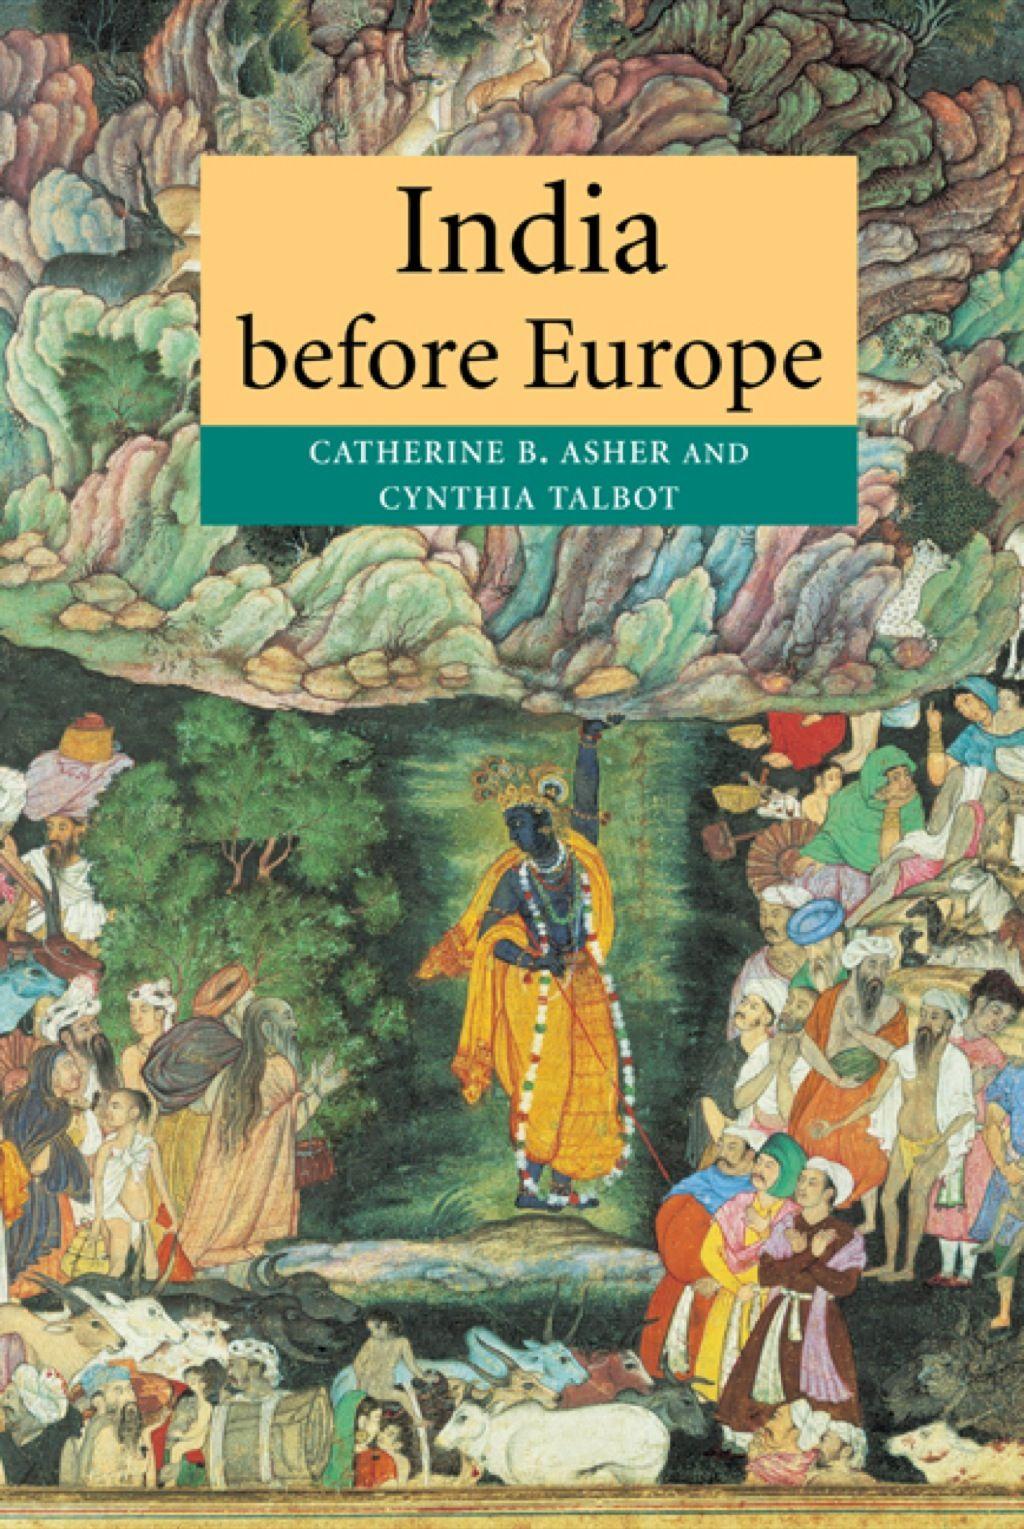 India Before Europe Ebook In 2020 India Book Europe India